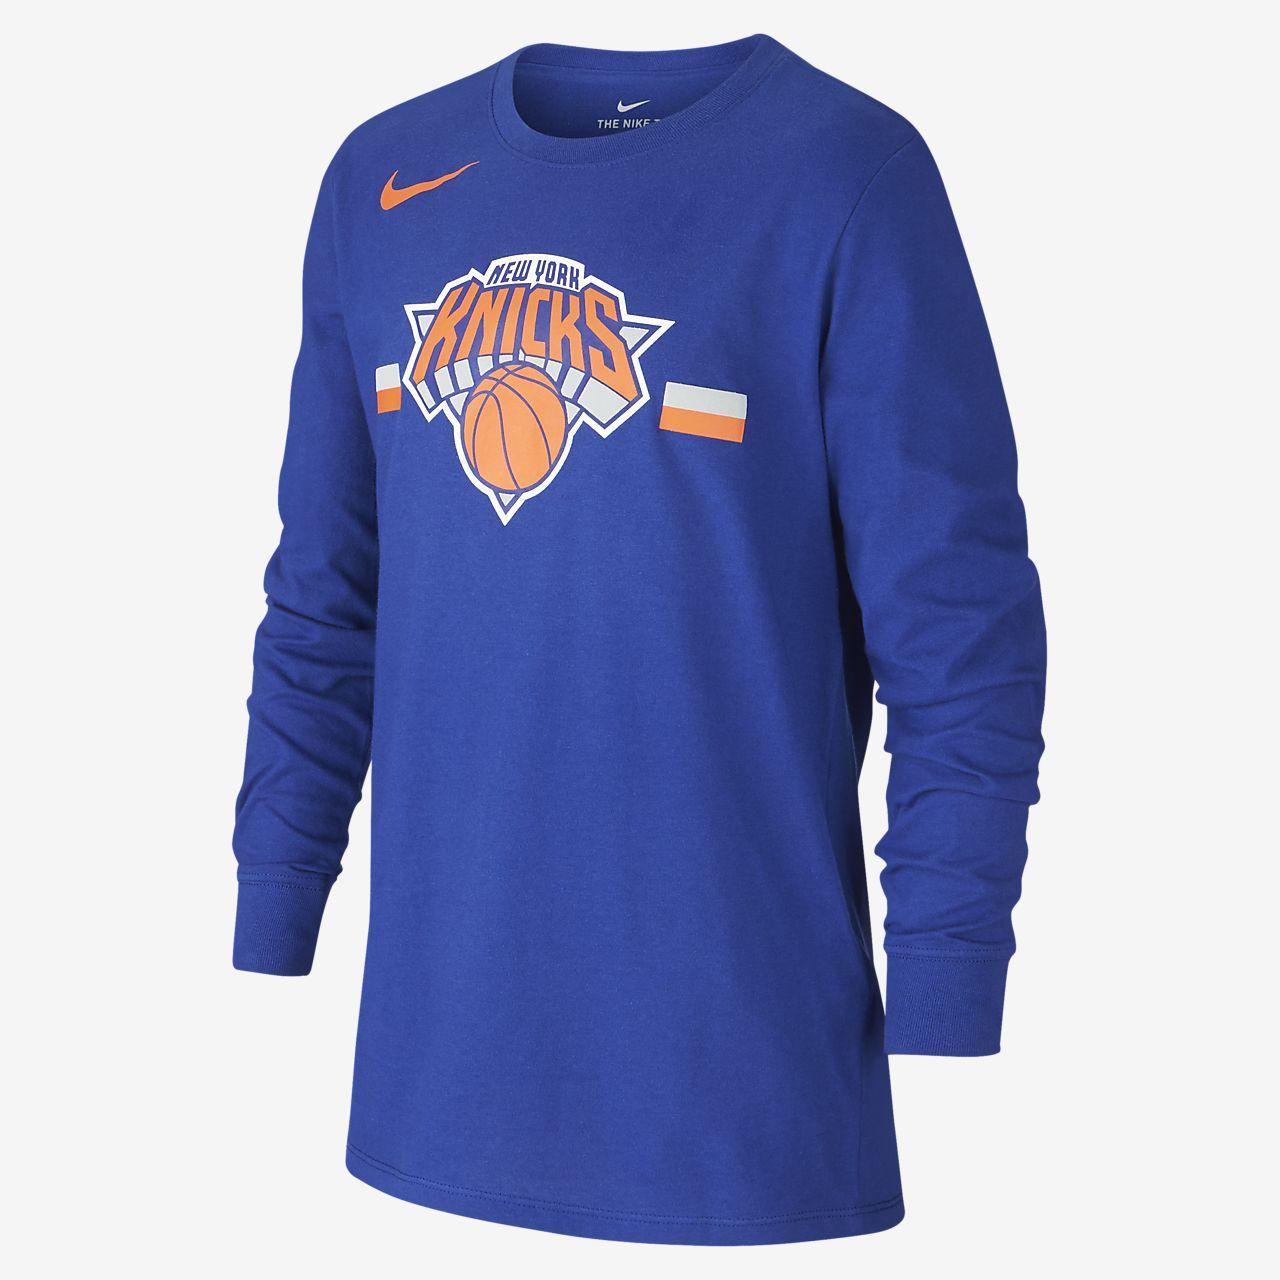 New York Knicks Nike Dri-FIT Logo Older Kids' Long-Sleeve NBA T-Shirt